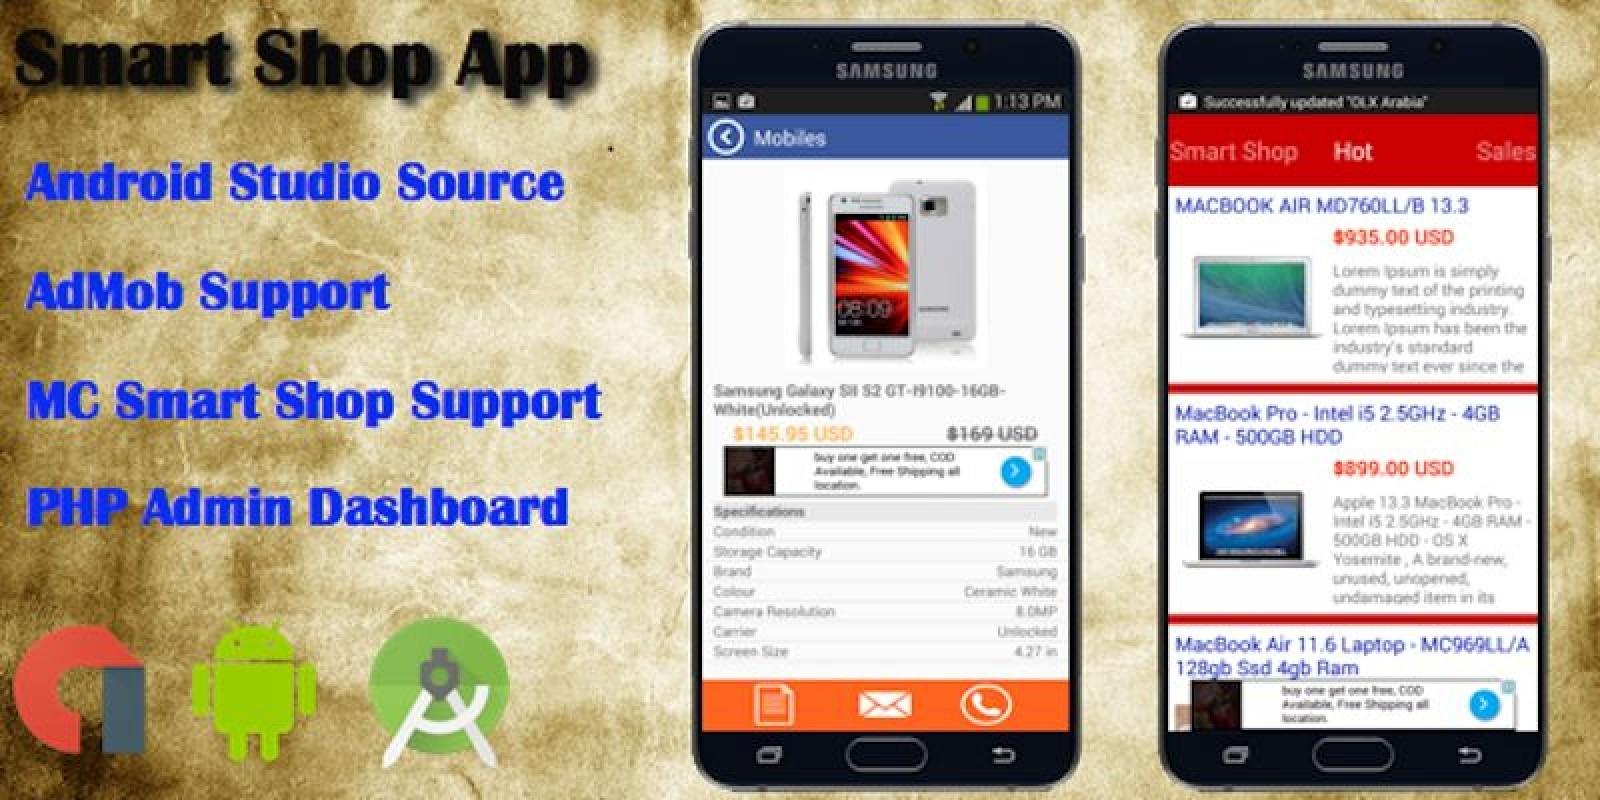 MC Smart Shop - Android App Source Code